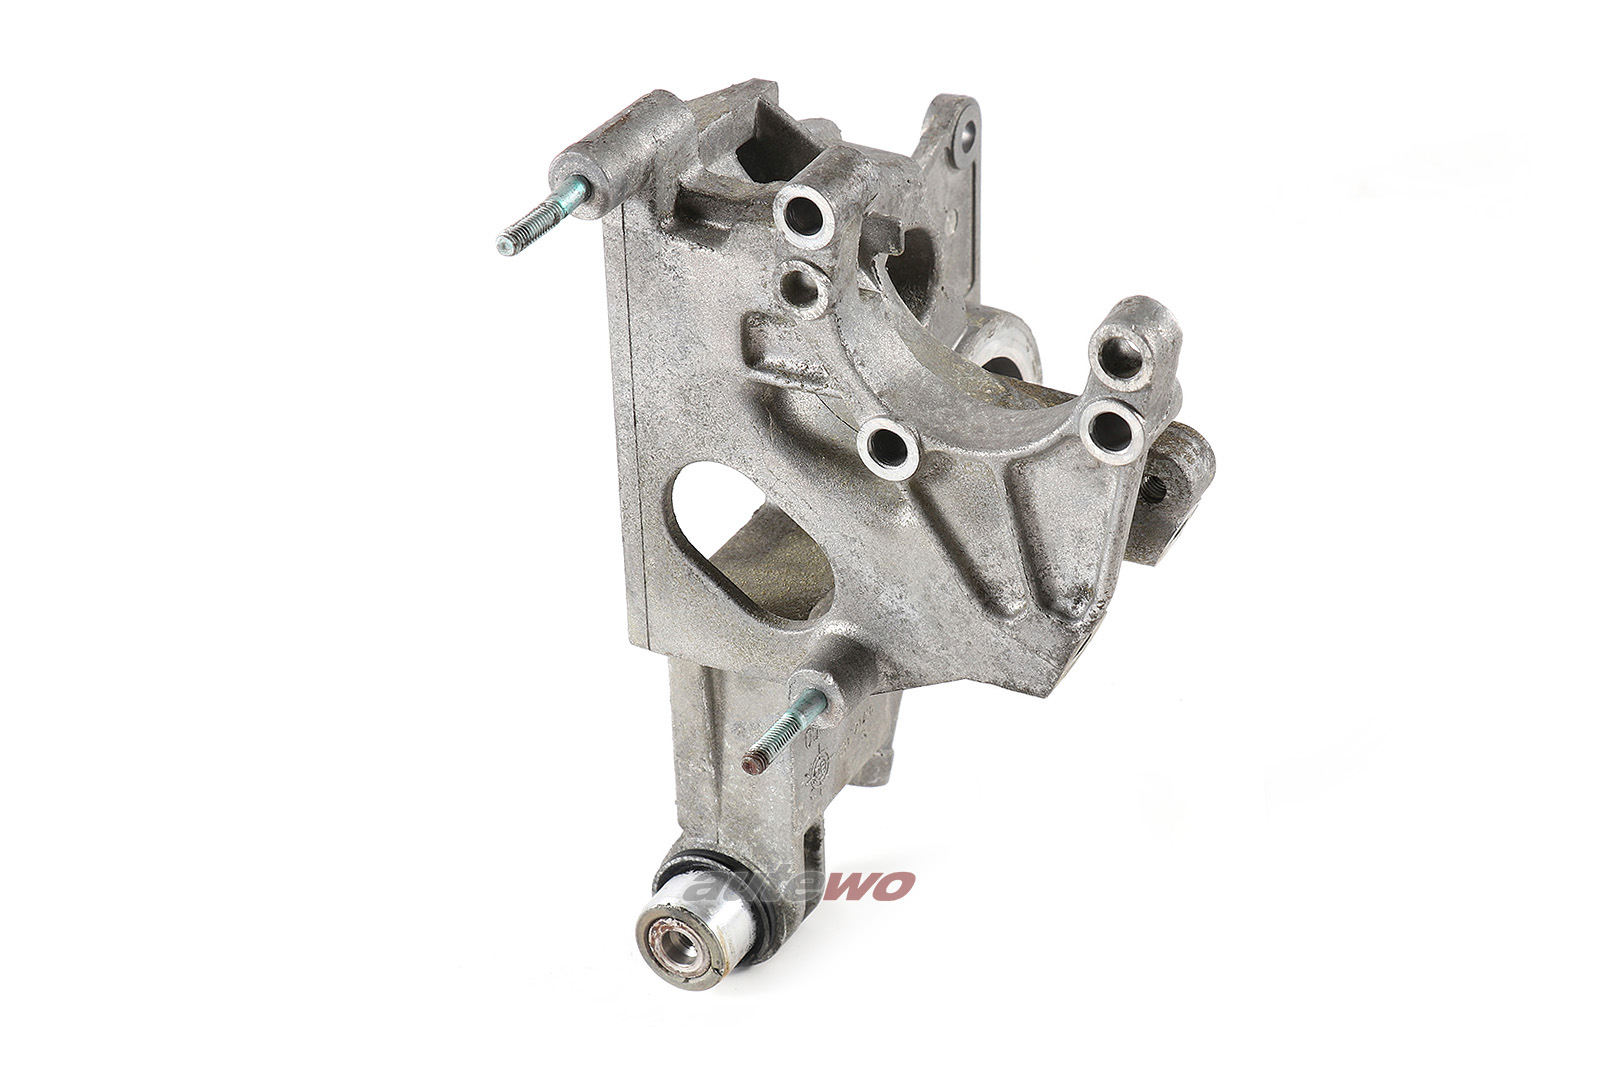 059145169 059145167E Audi A4 B5/8E/A6 4B/A8 2.5l TDI Halter Servopumpe/Ölkühler